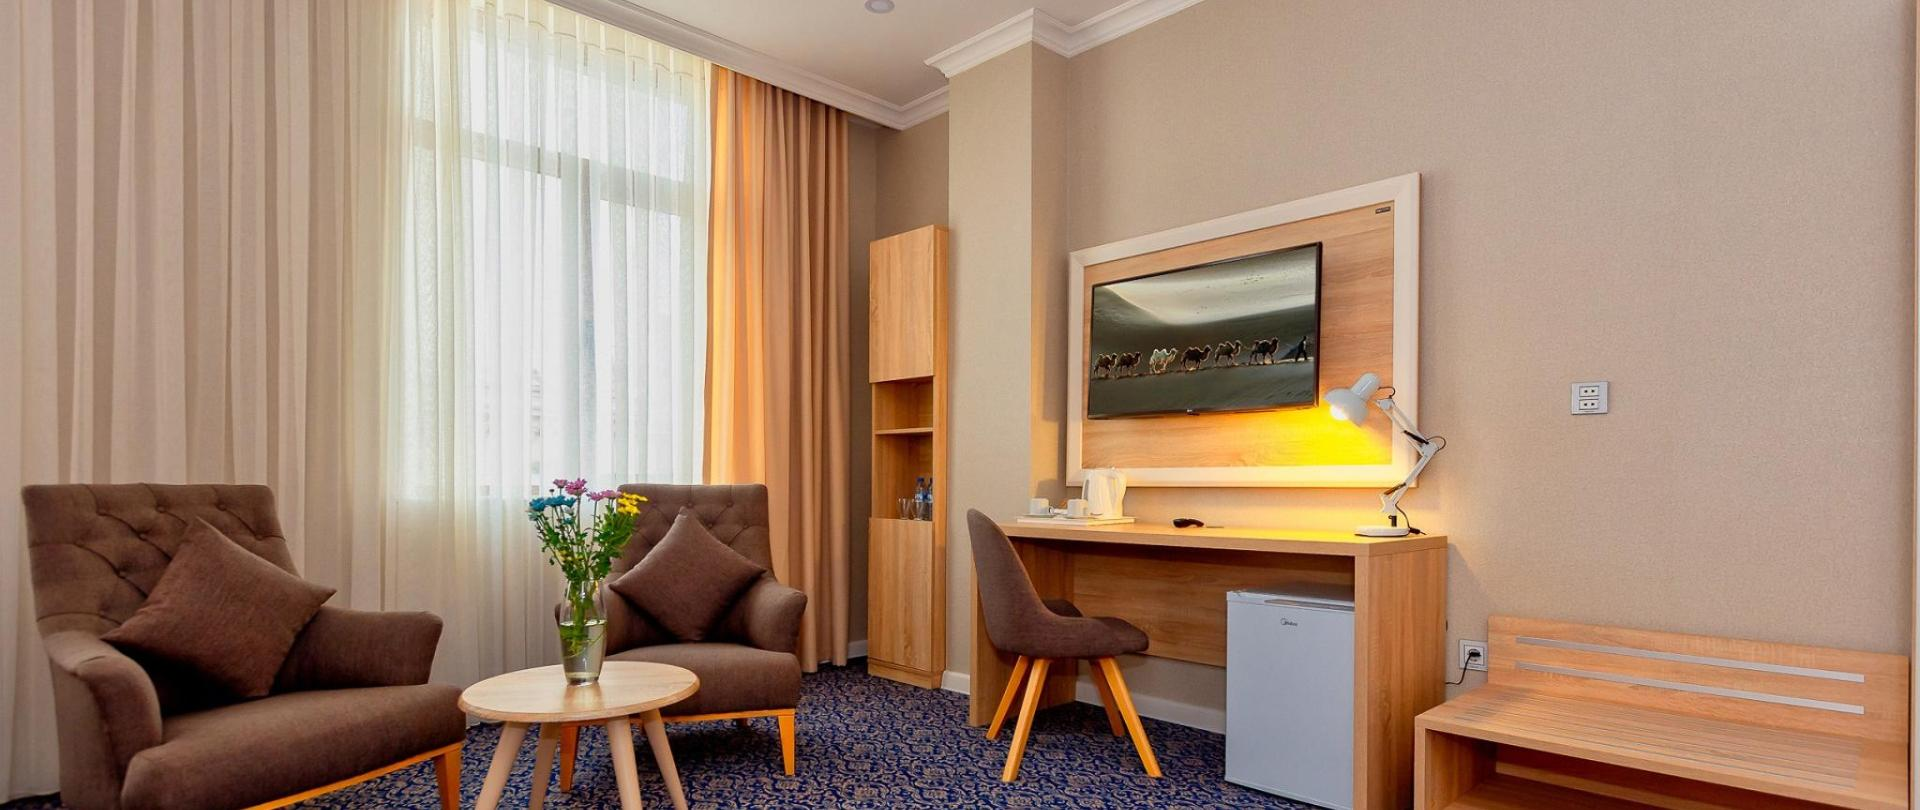 Metrocity Hotel-28.jpg